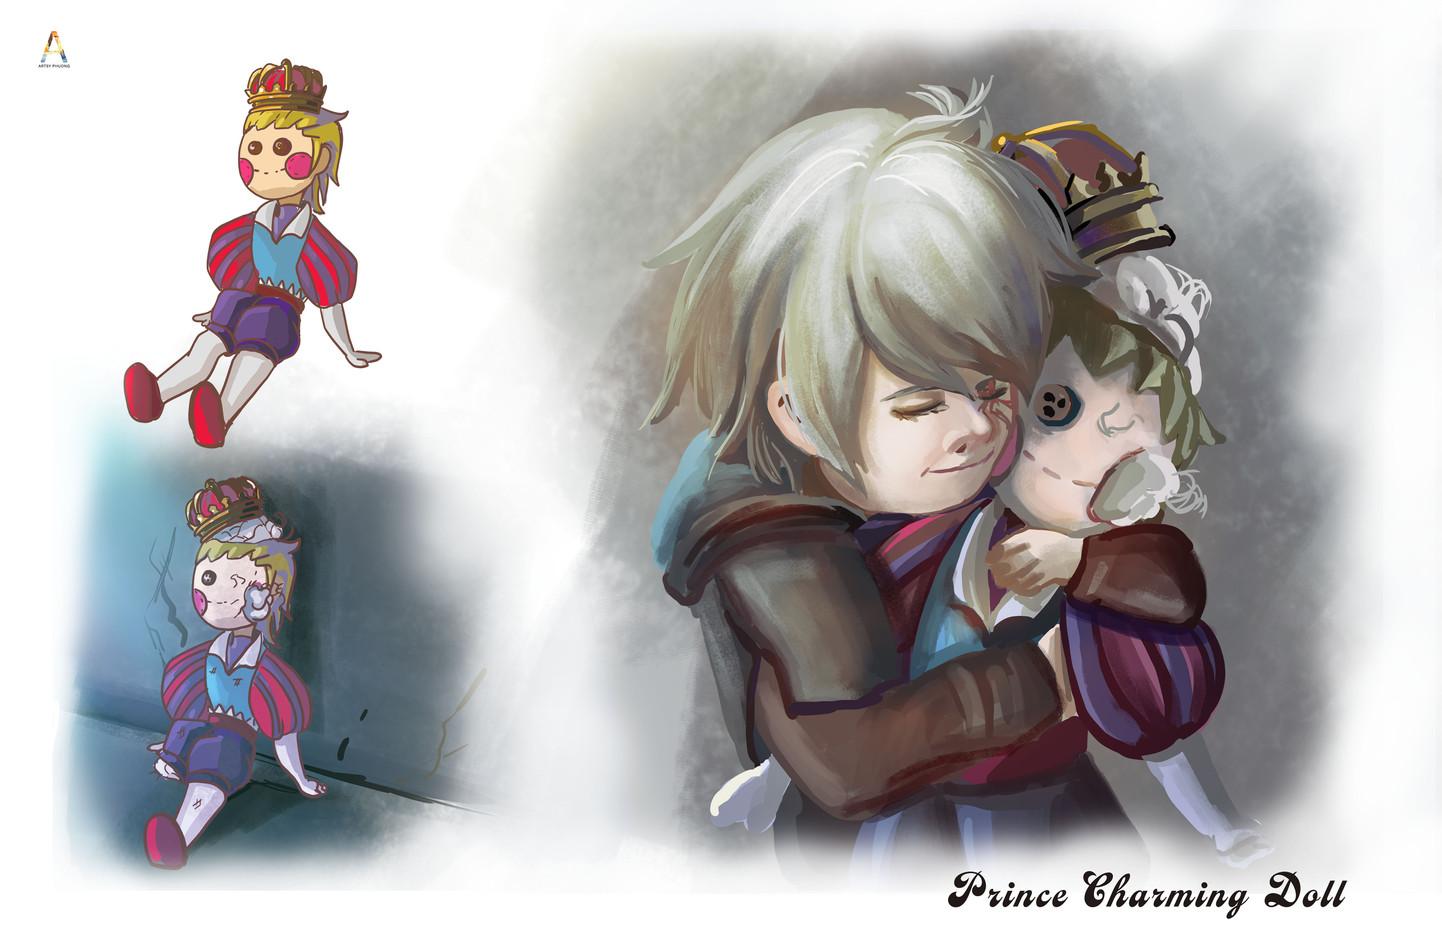 Prince charming Doll.jpg